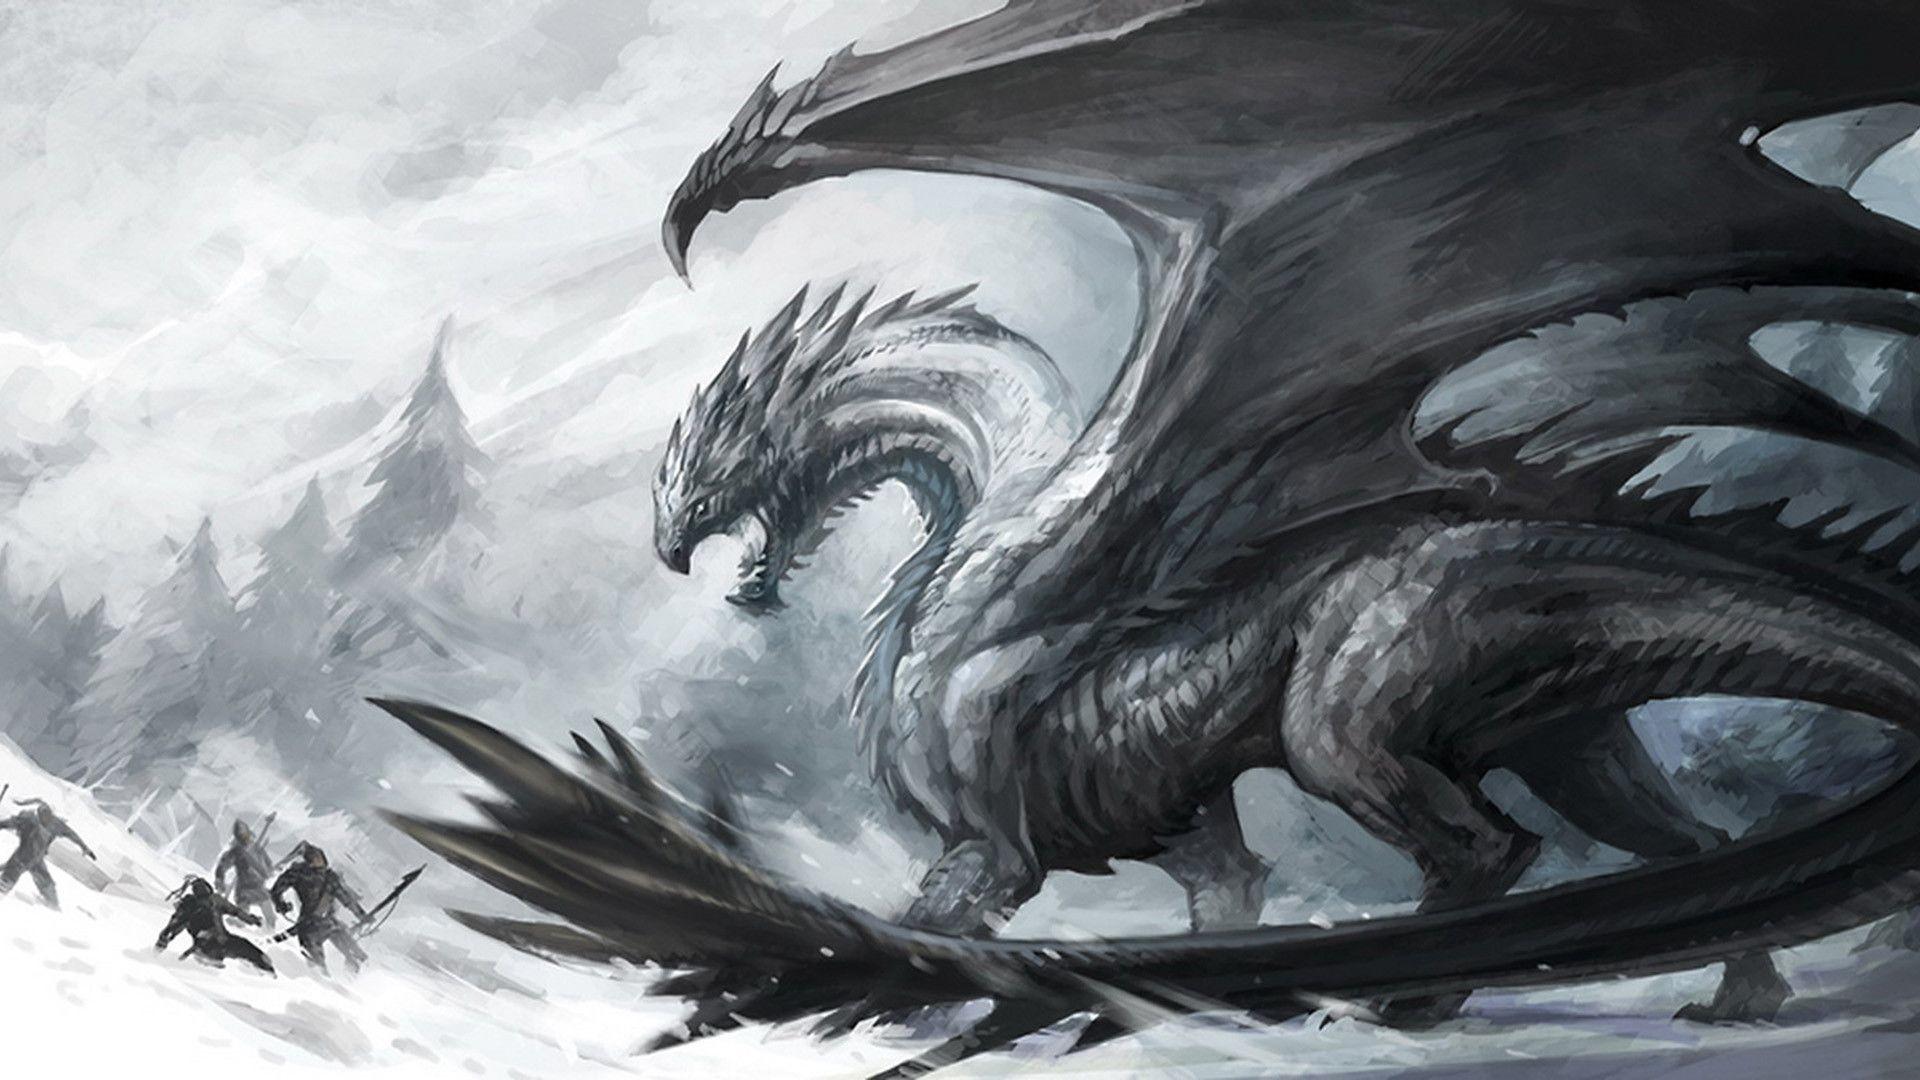 Top HD Dragon Wallpapers, Images, Backgrounds, Desktop 1280×1024 Black  Dragon Wallpapers